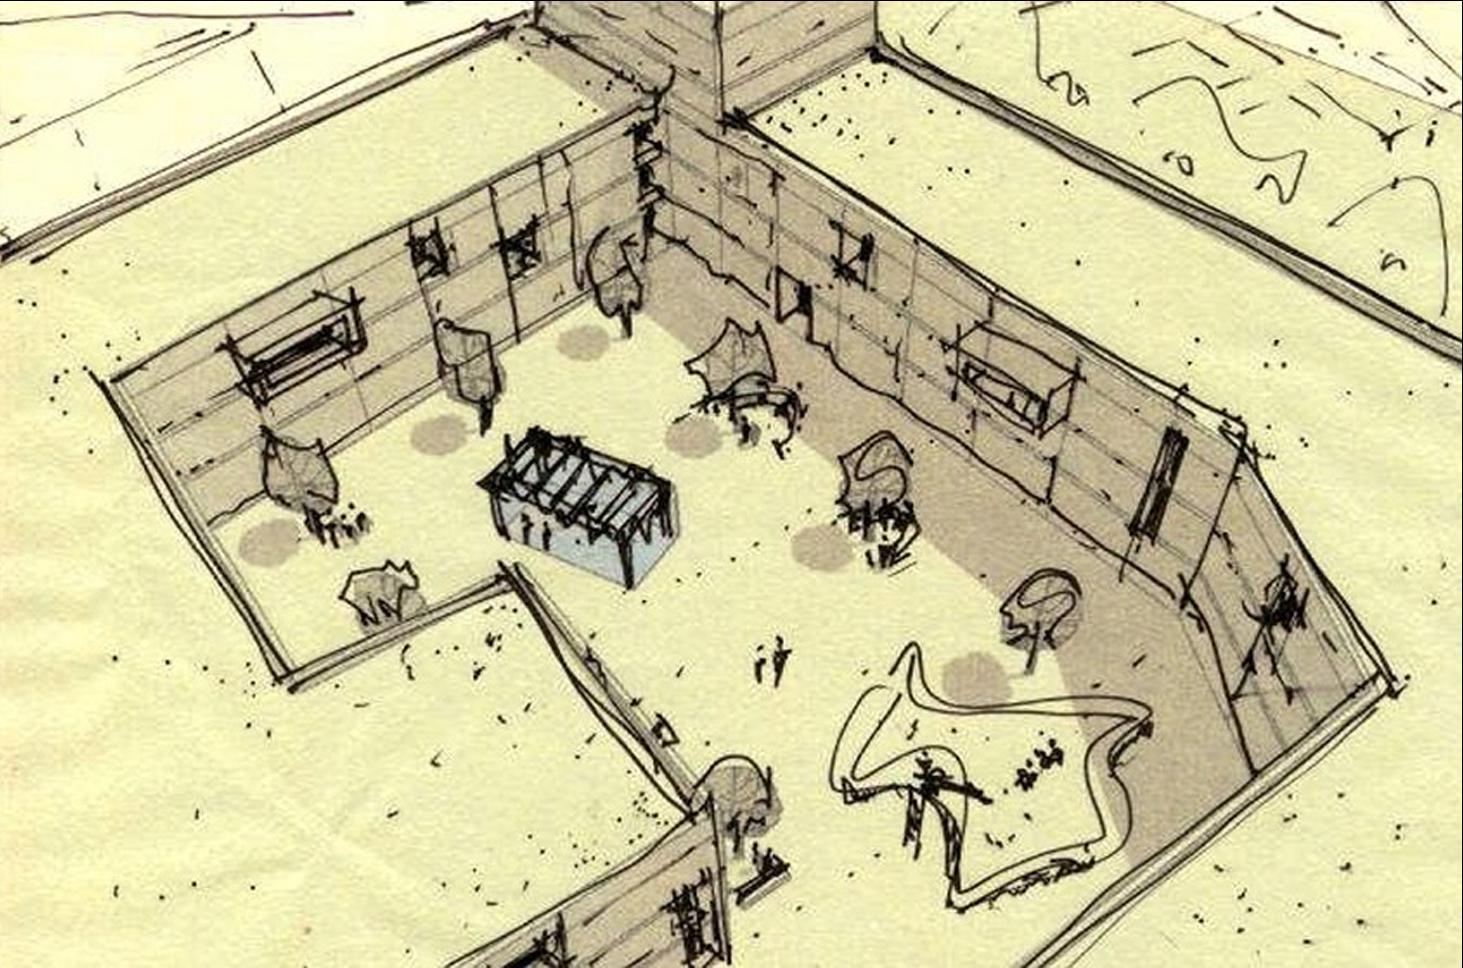 Tibilisi_courtyard sketch_oblique